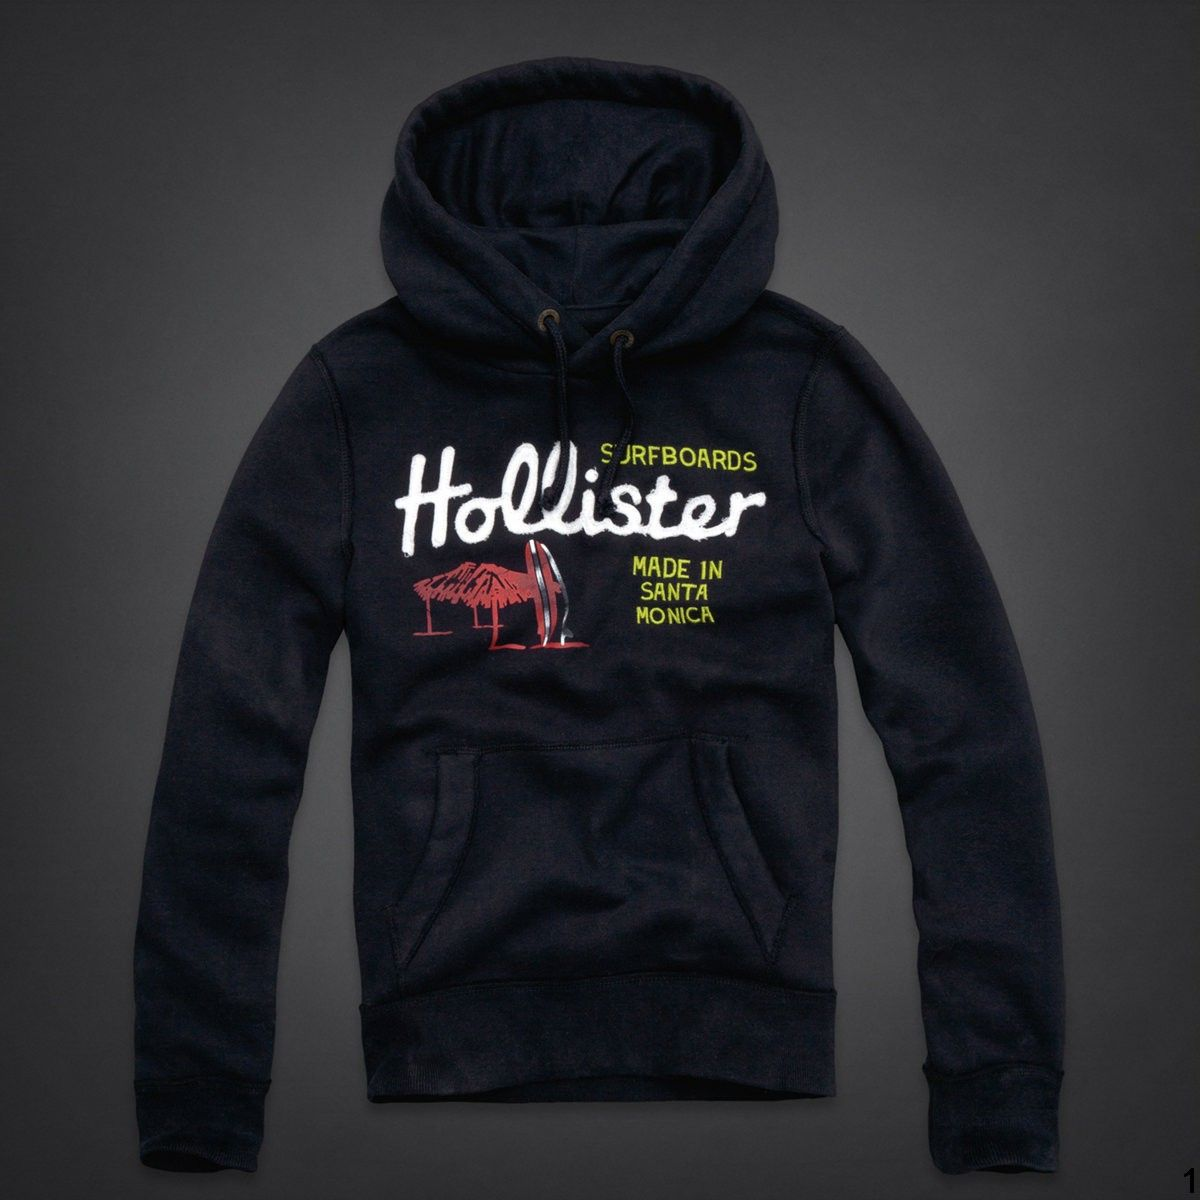 Black t shirts hollister - Hollister Mens Hoodies Sapphire Hco002